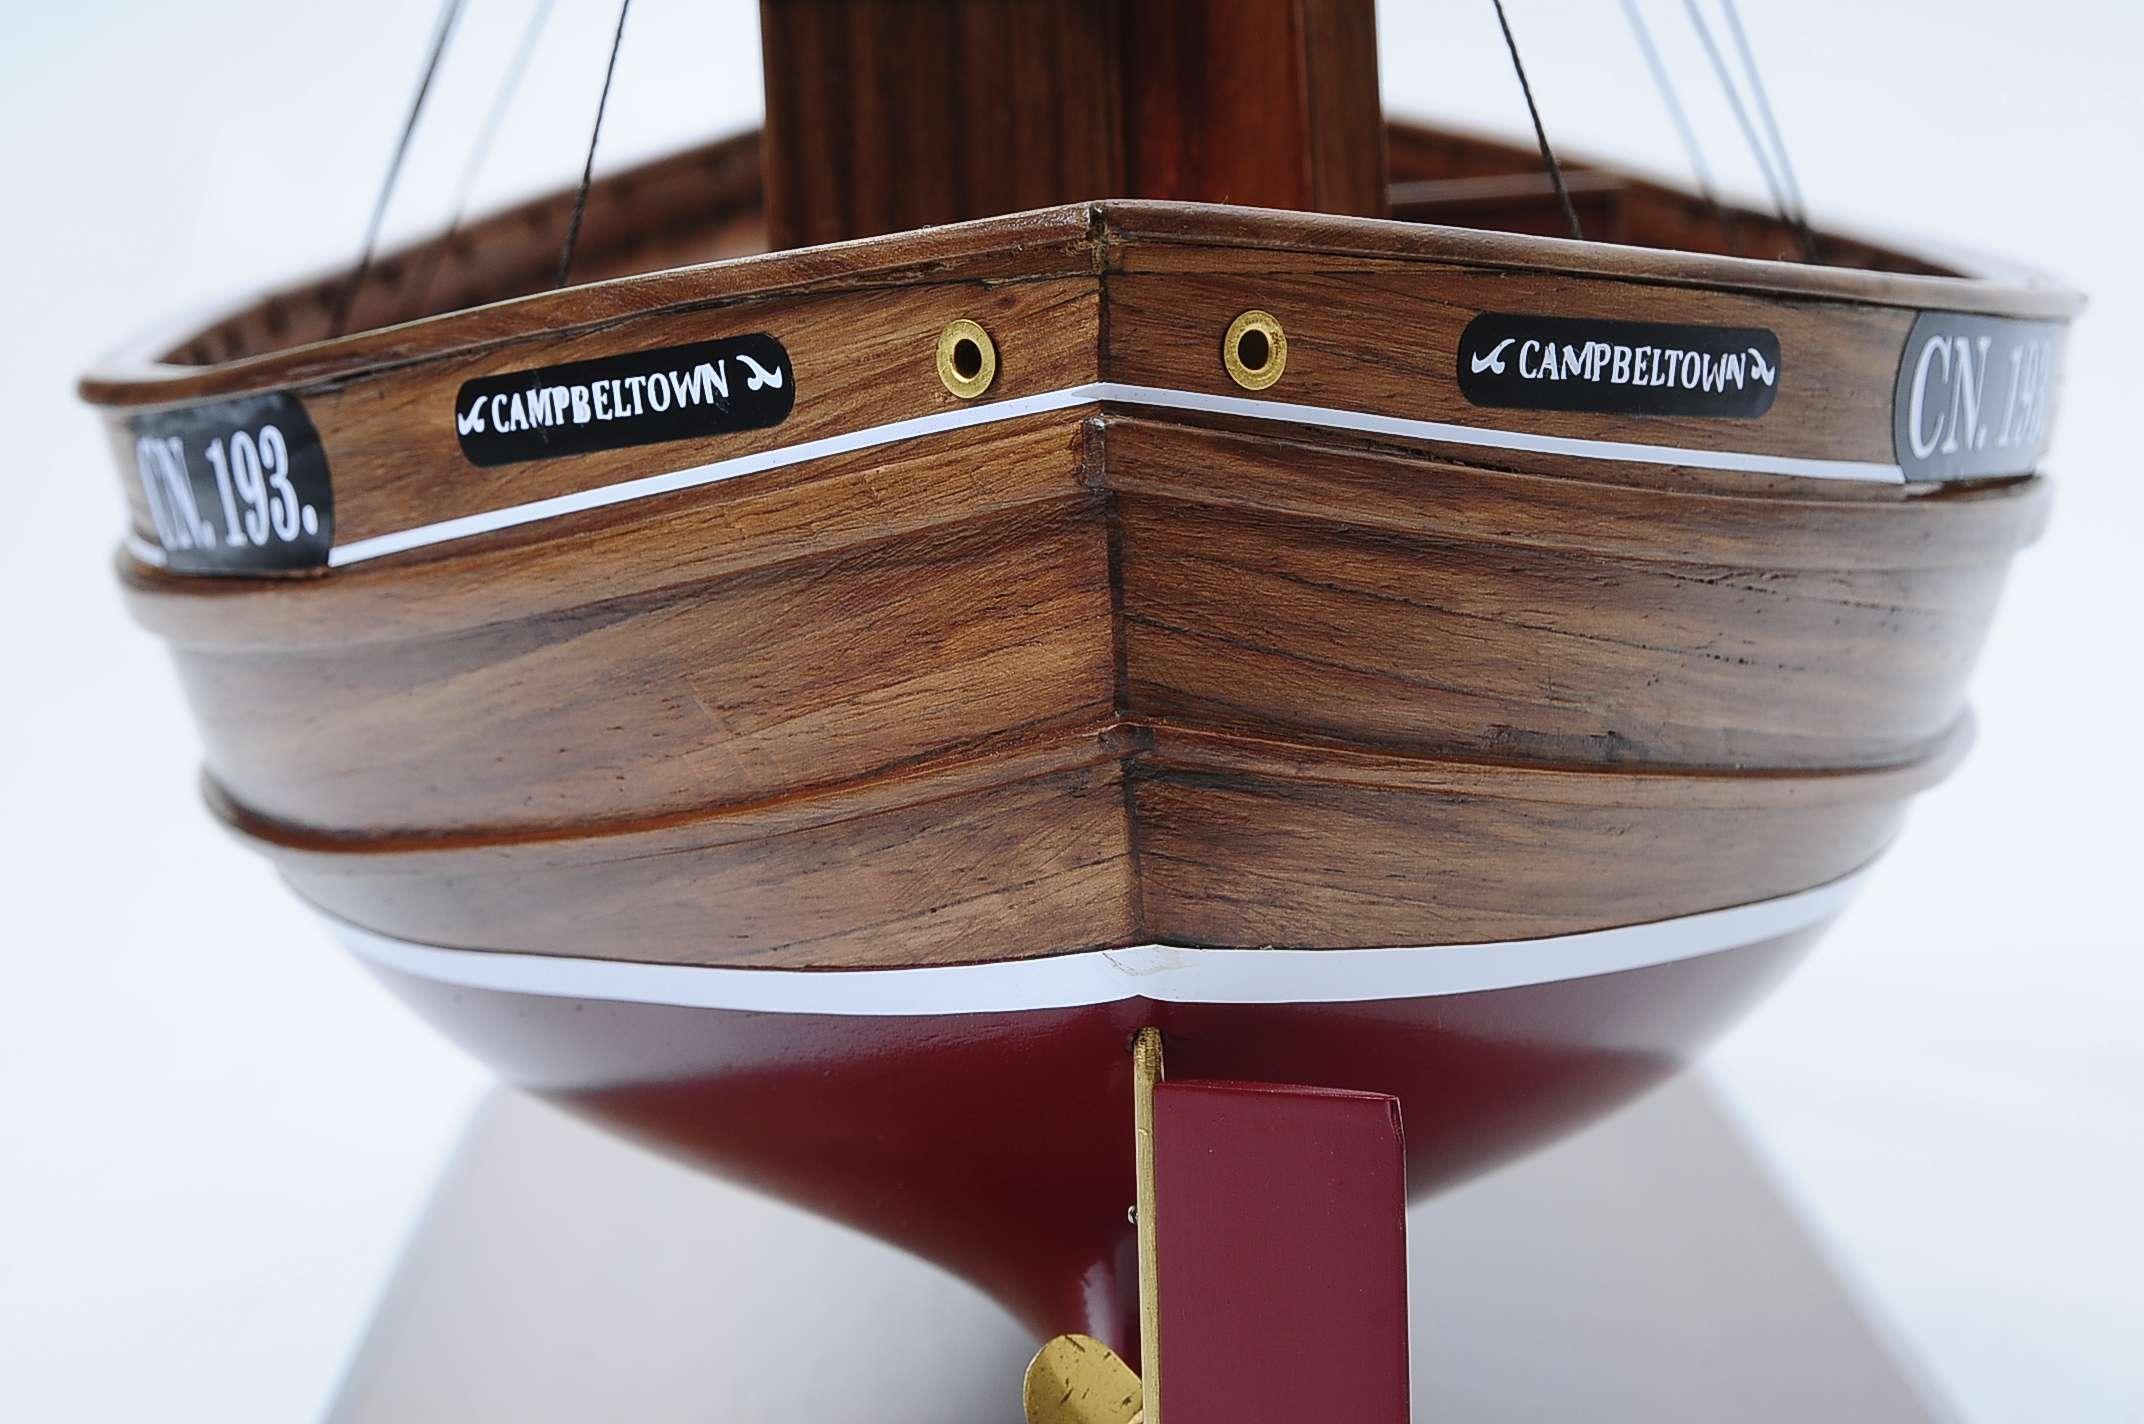 1431-4564-Mary-Mclean-CN193-Model-Boat